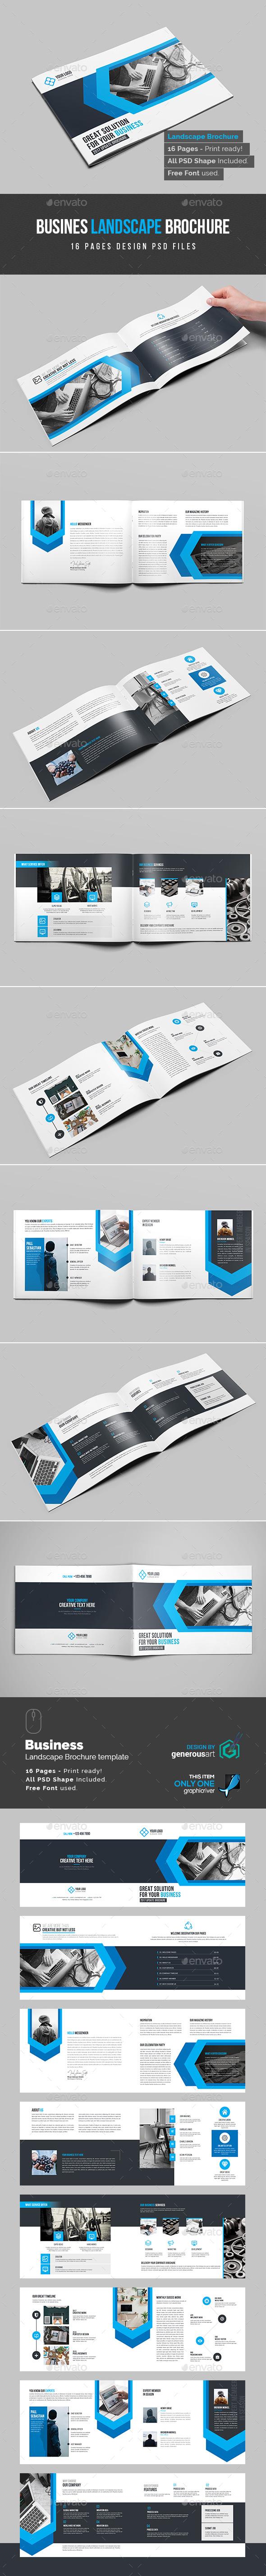 Landscape Bi-Fold Brochure Template - Brochures Print Templates